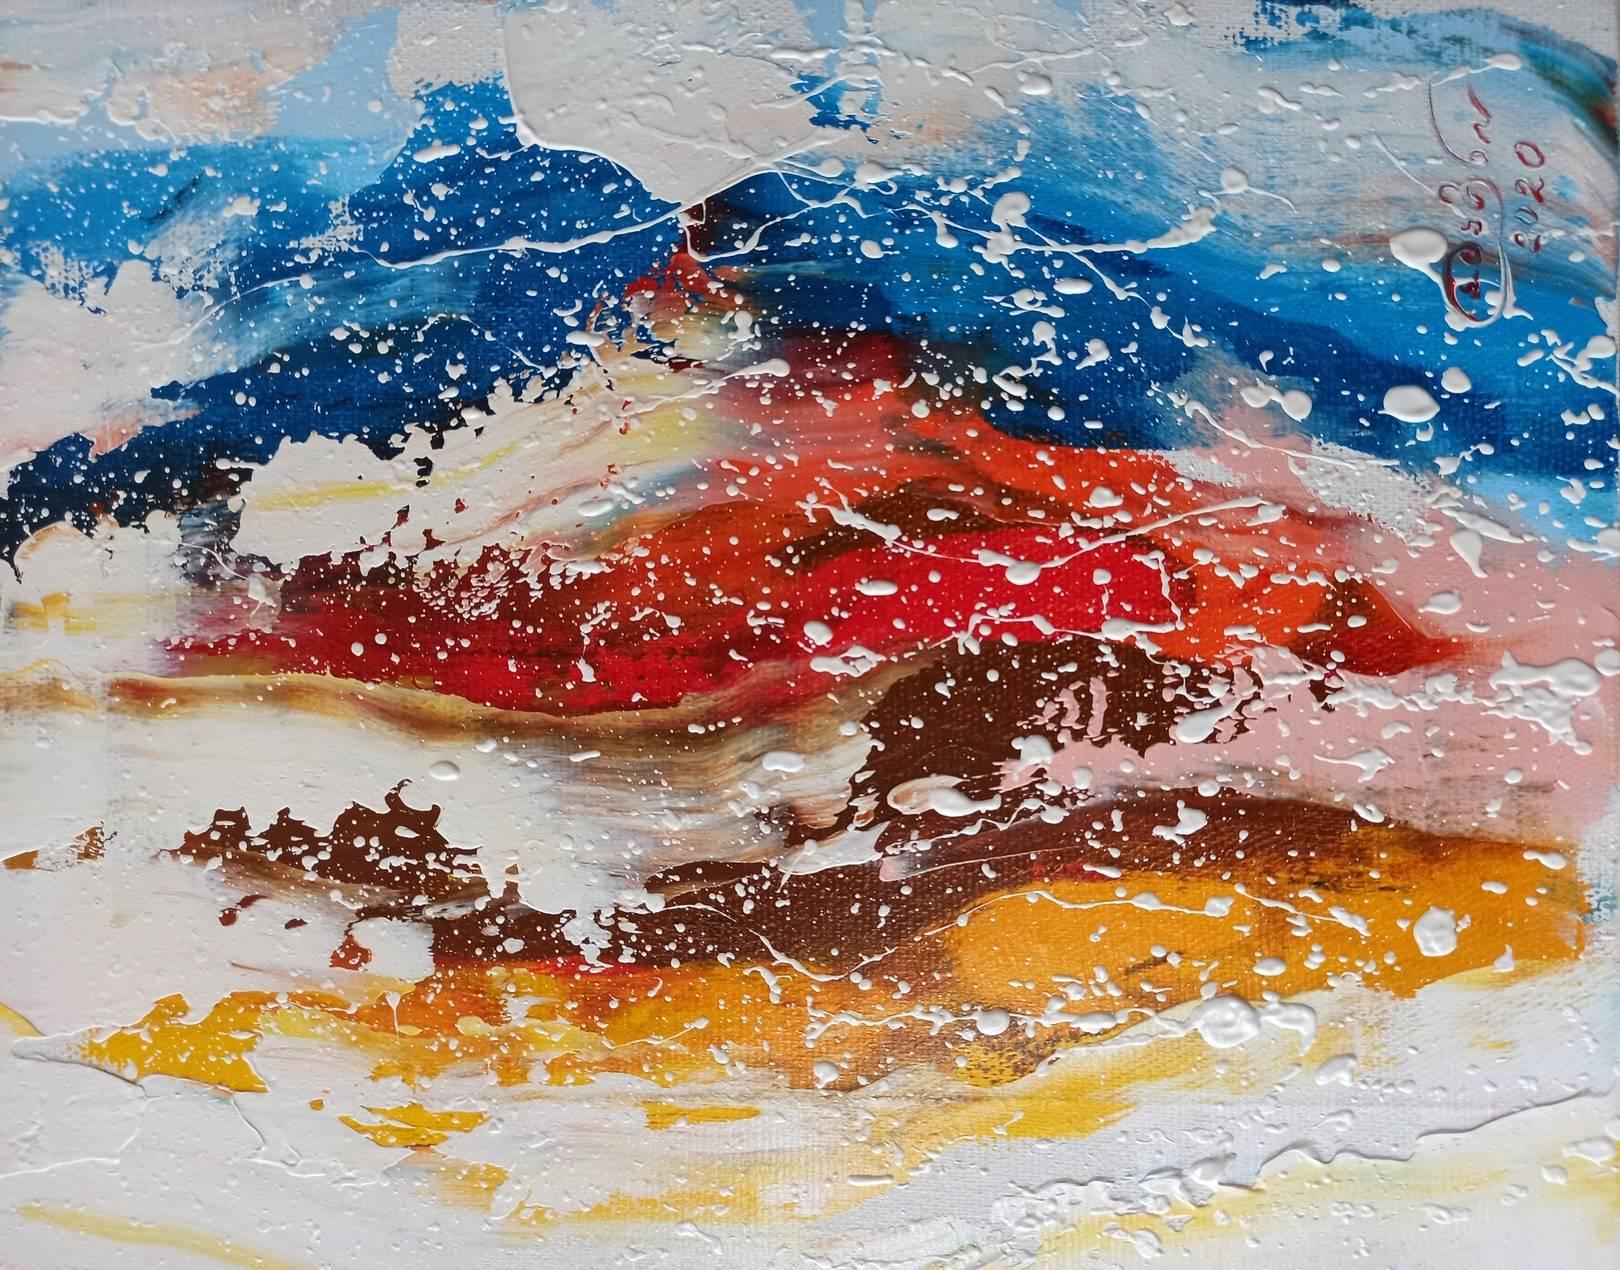 «Пейзаж» холст, масло «Landscape» oil on canvas  24x30, 2020